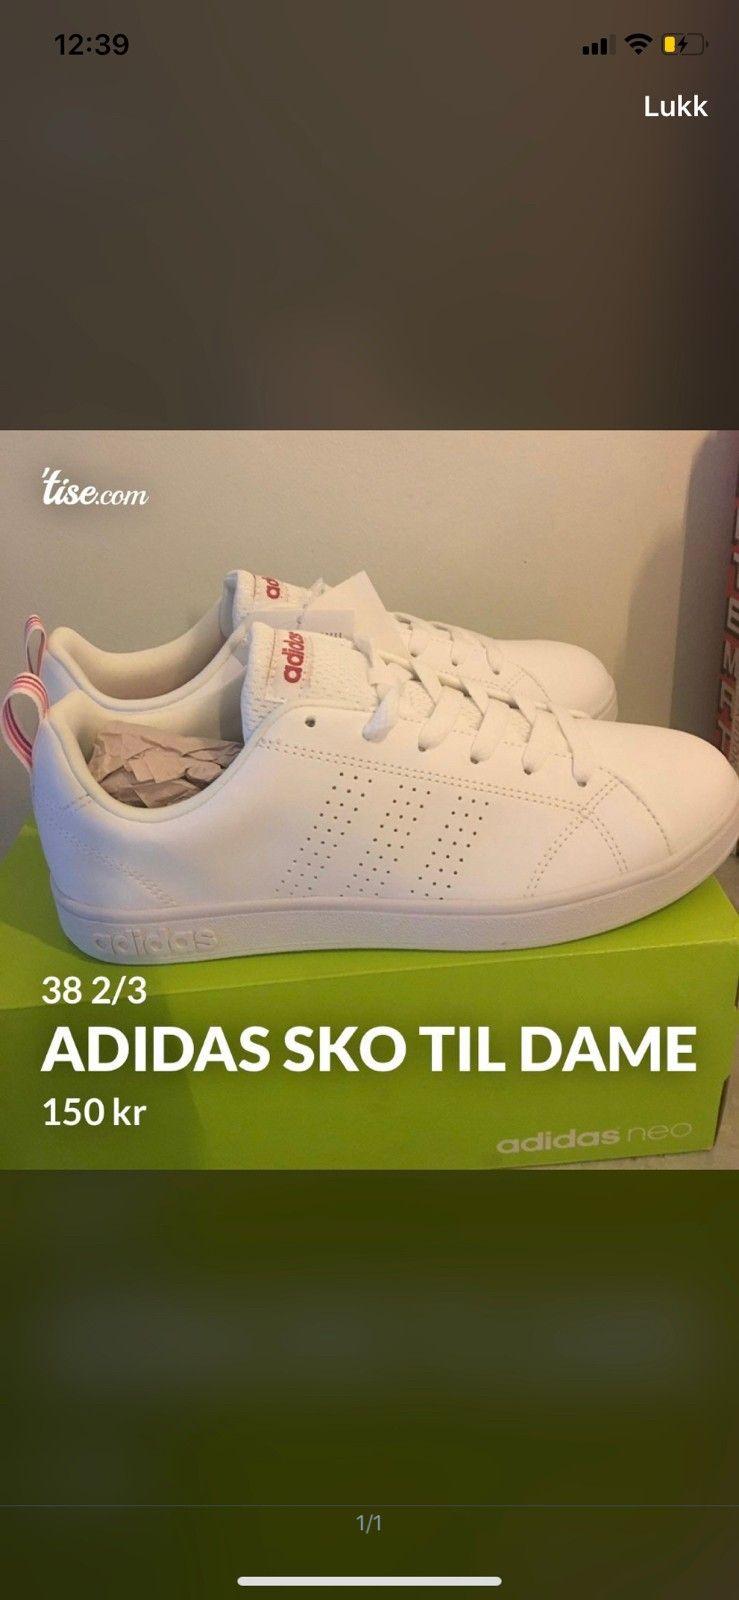 Adidas sko til dame | FINN.no